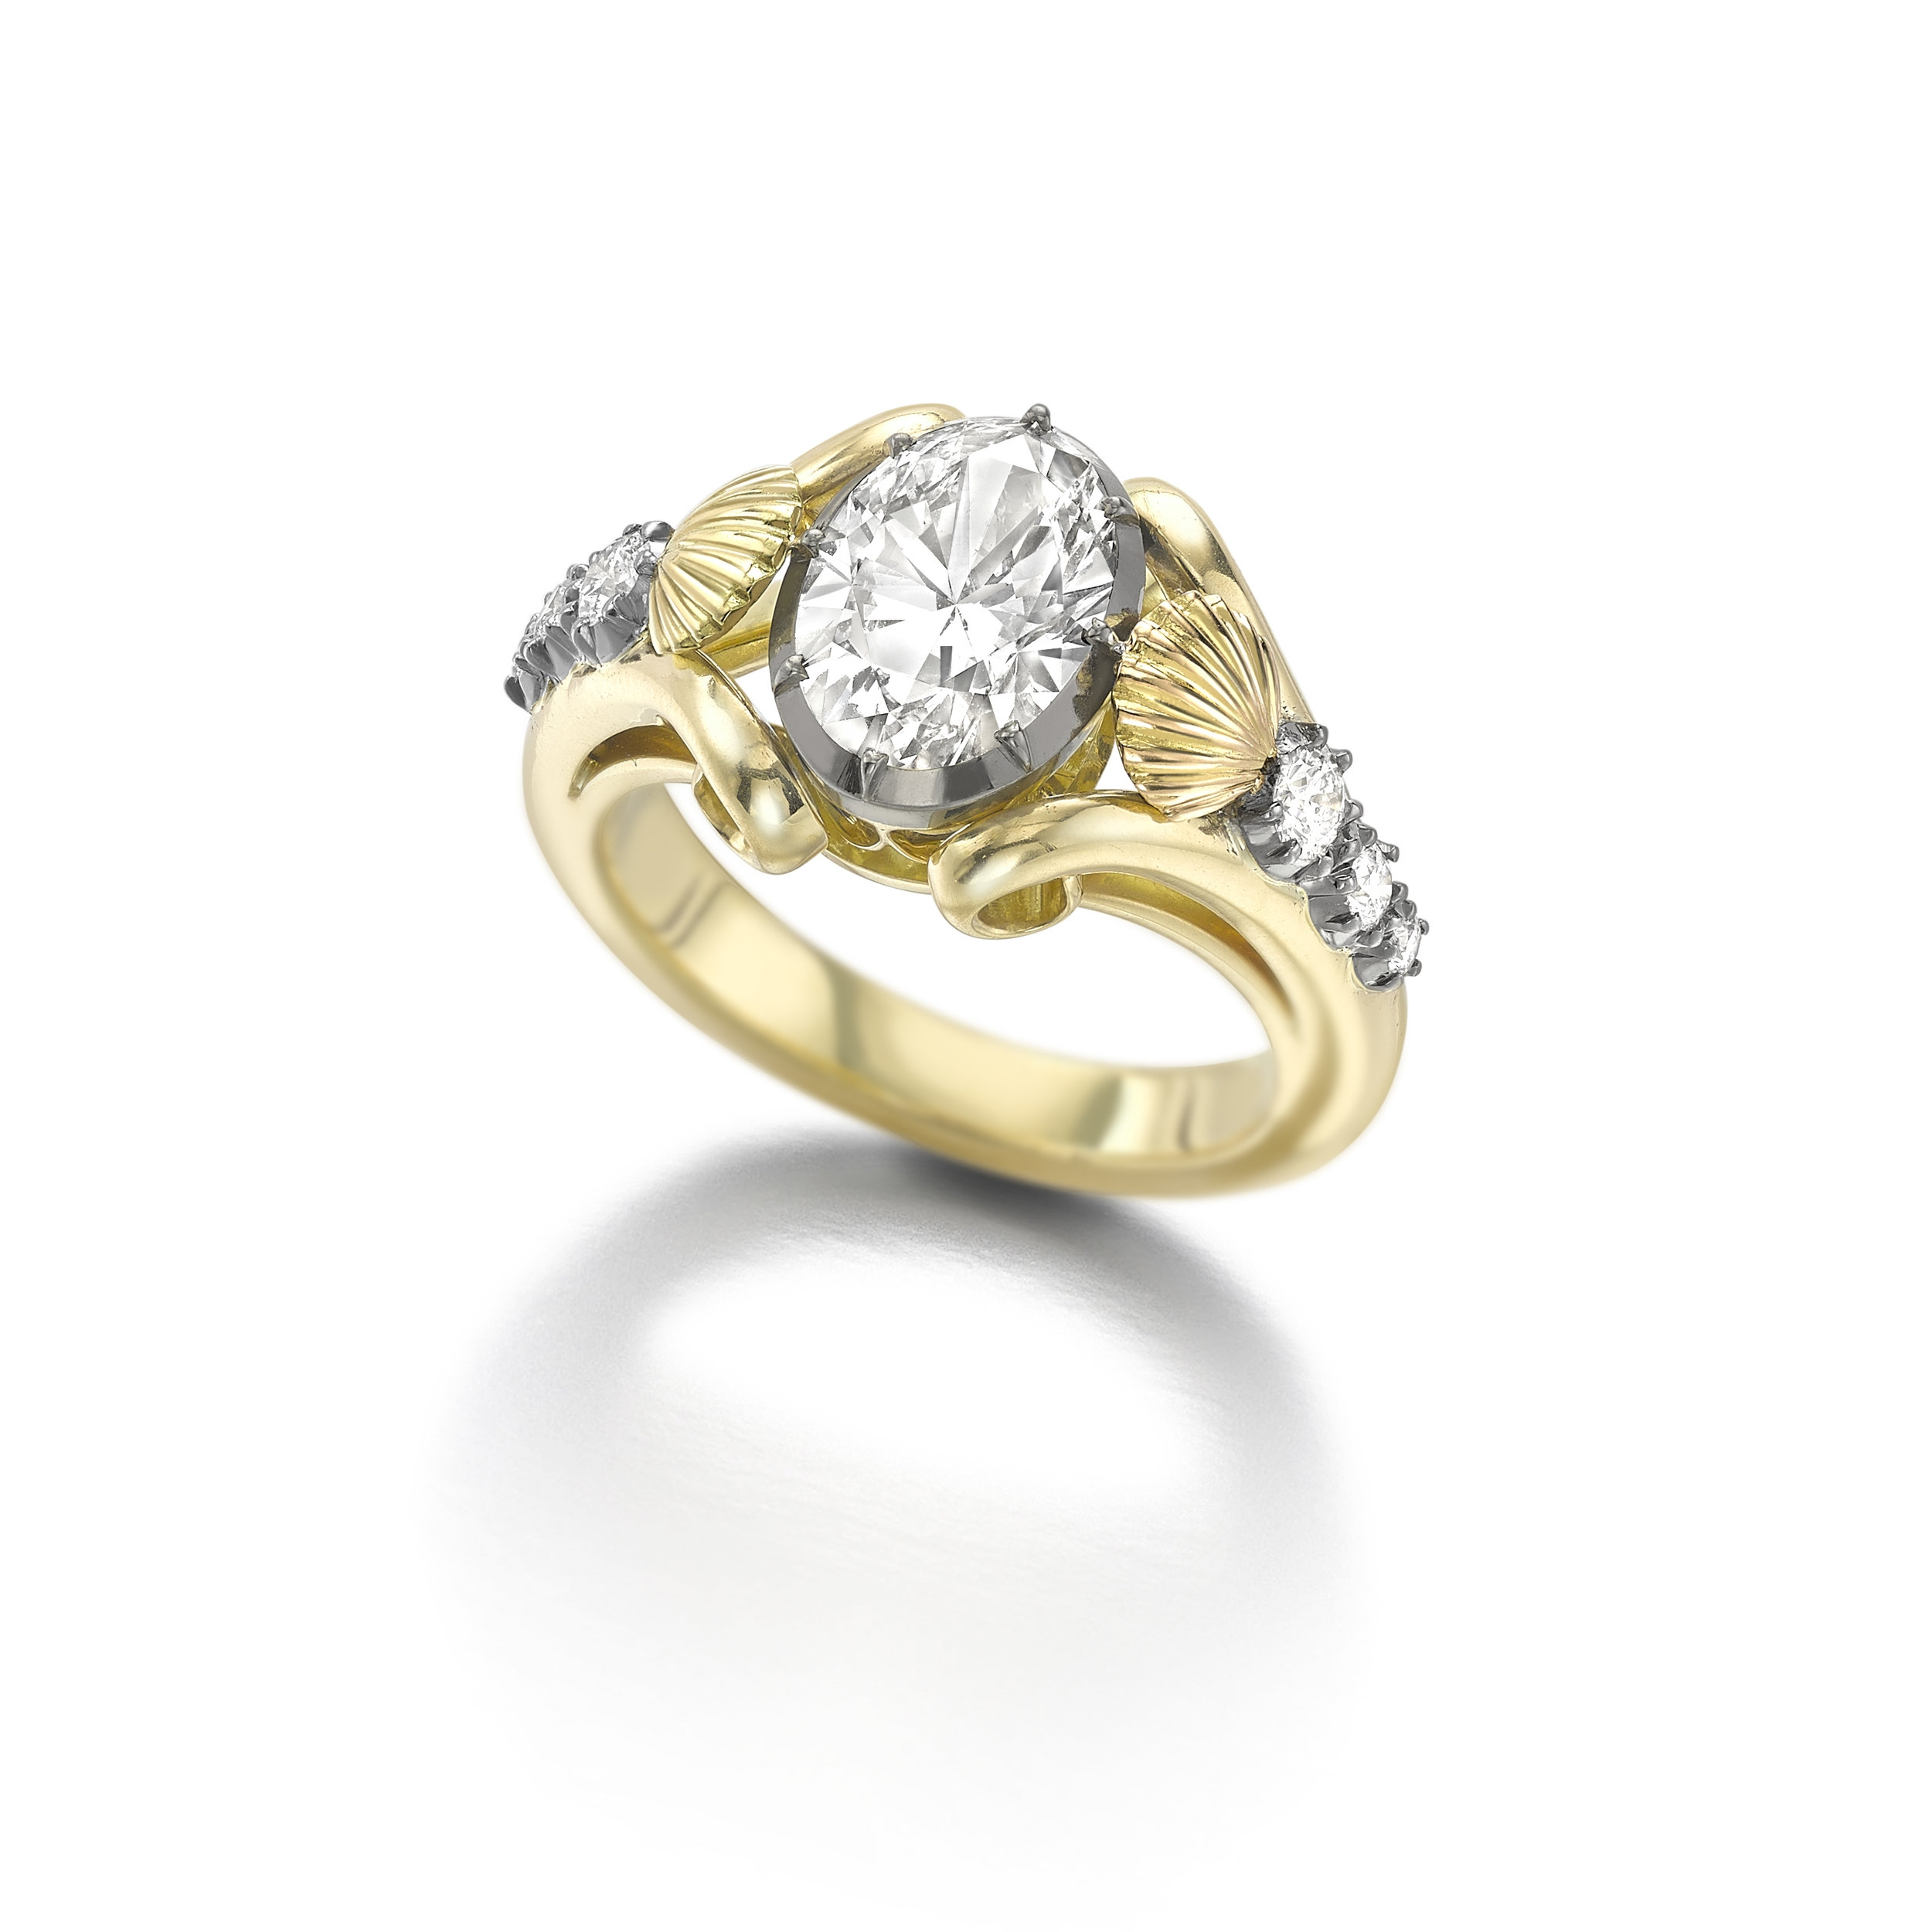 The Little Mermaid Ring